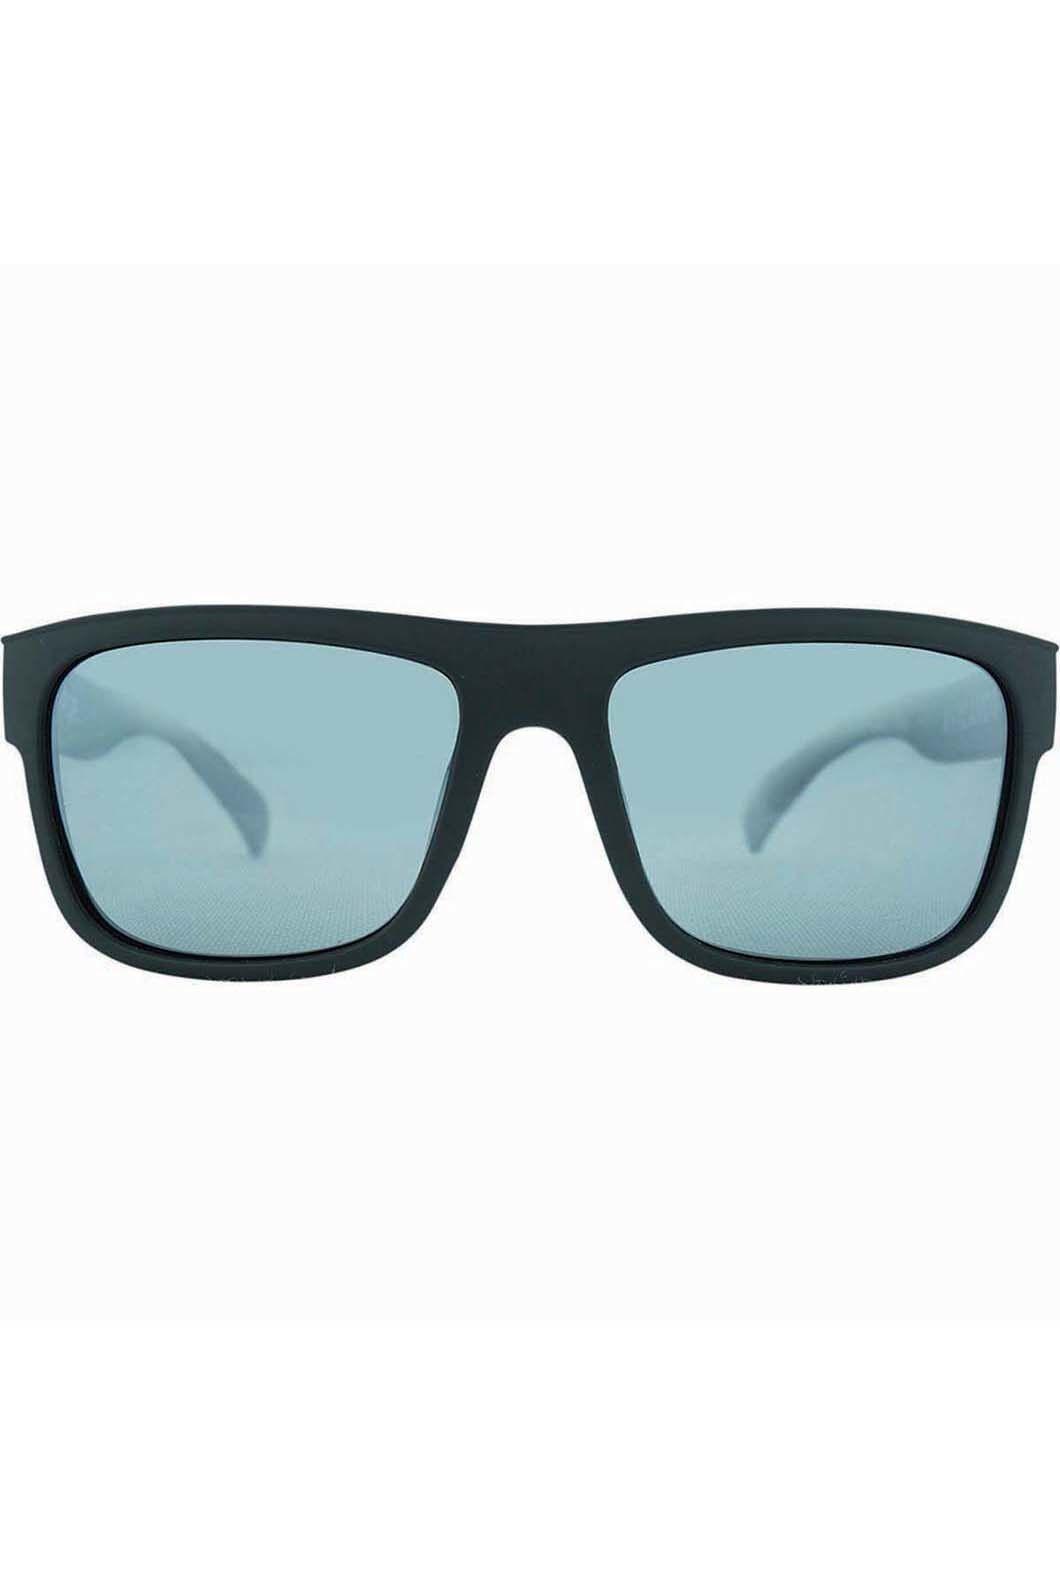 Venture Eyewear Men's Avalanche Sunglasses, BLACK/SMOKE, hi-res